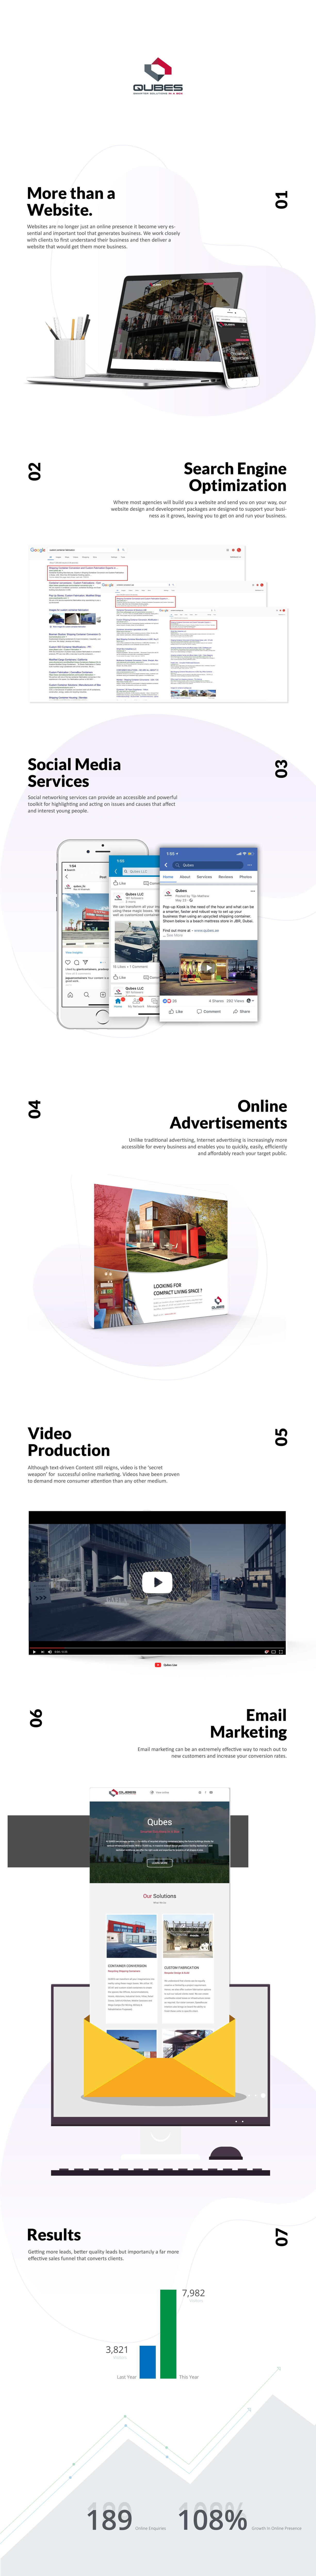 Qubes Digital Marketing by Sajid Sulaiman - Digital Marketing Expert UAE